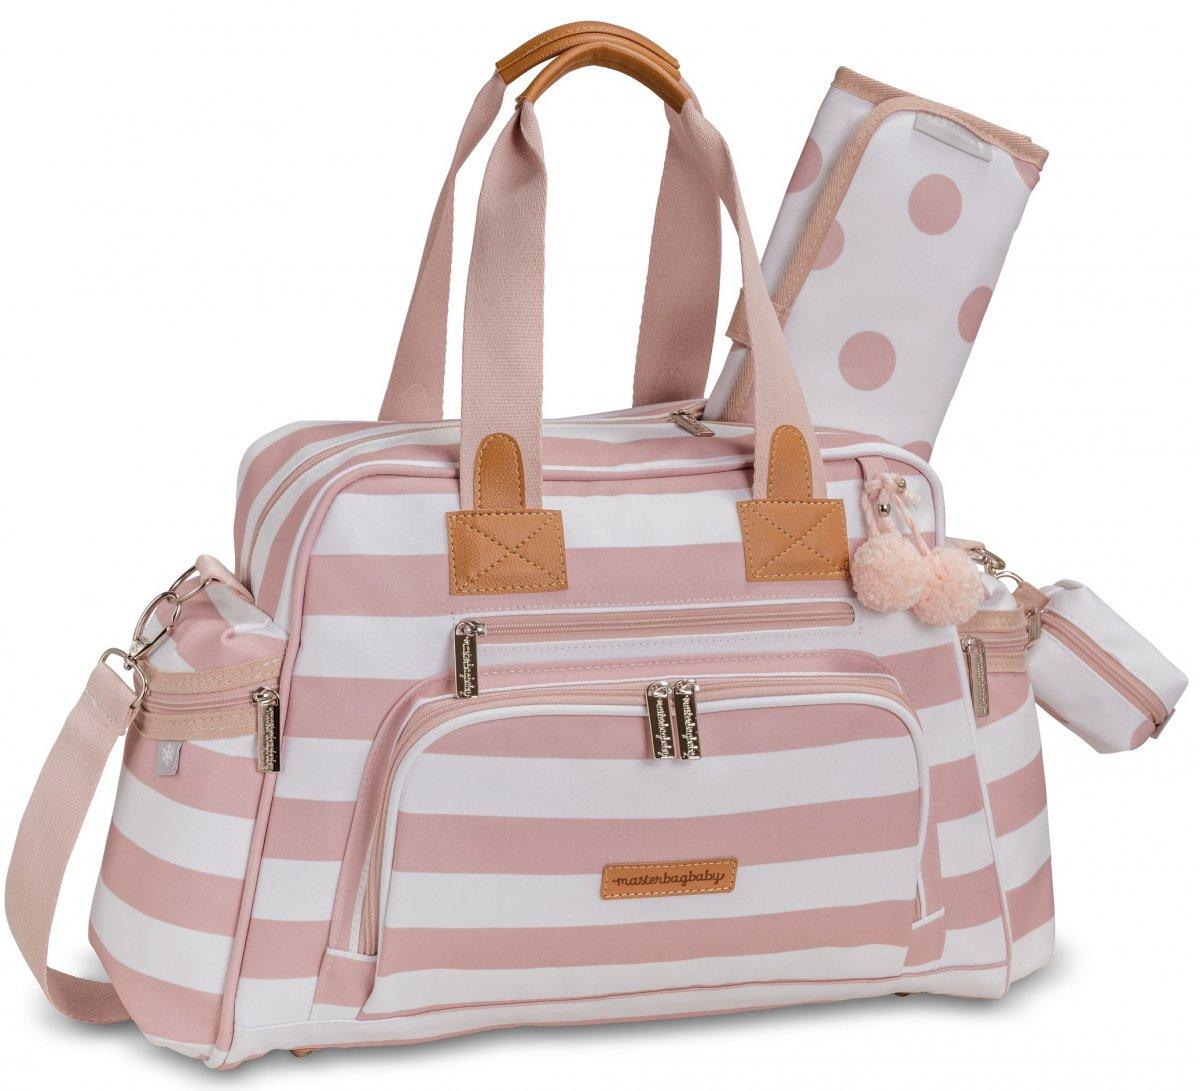 Bolsa Maternidade Masterbag Baby Everyday Brooklyn   Cor: Rosa